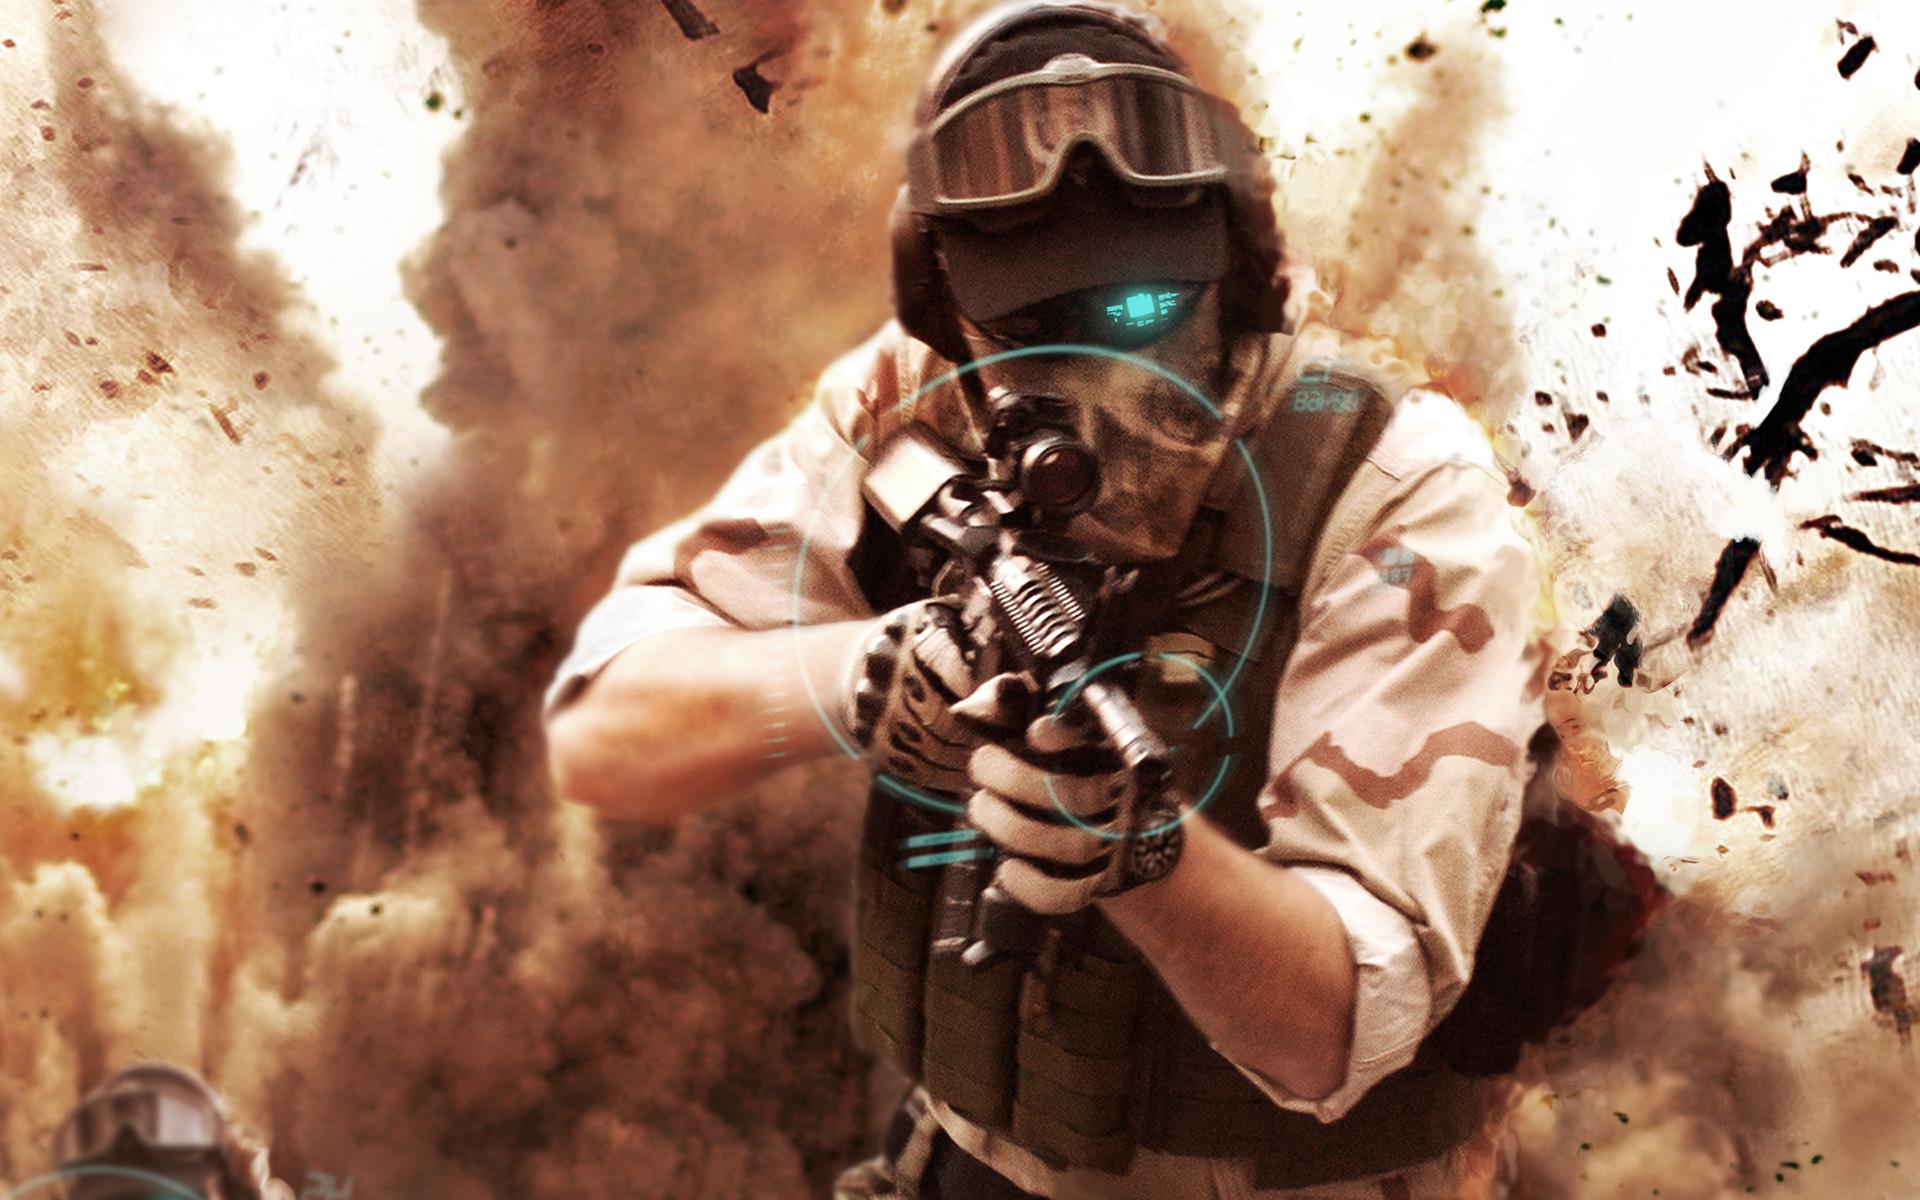 Soldier, Running, Ghost Recon Future Soldier, Rifle, Running Away, War